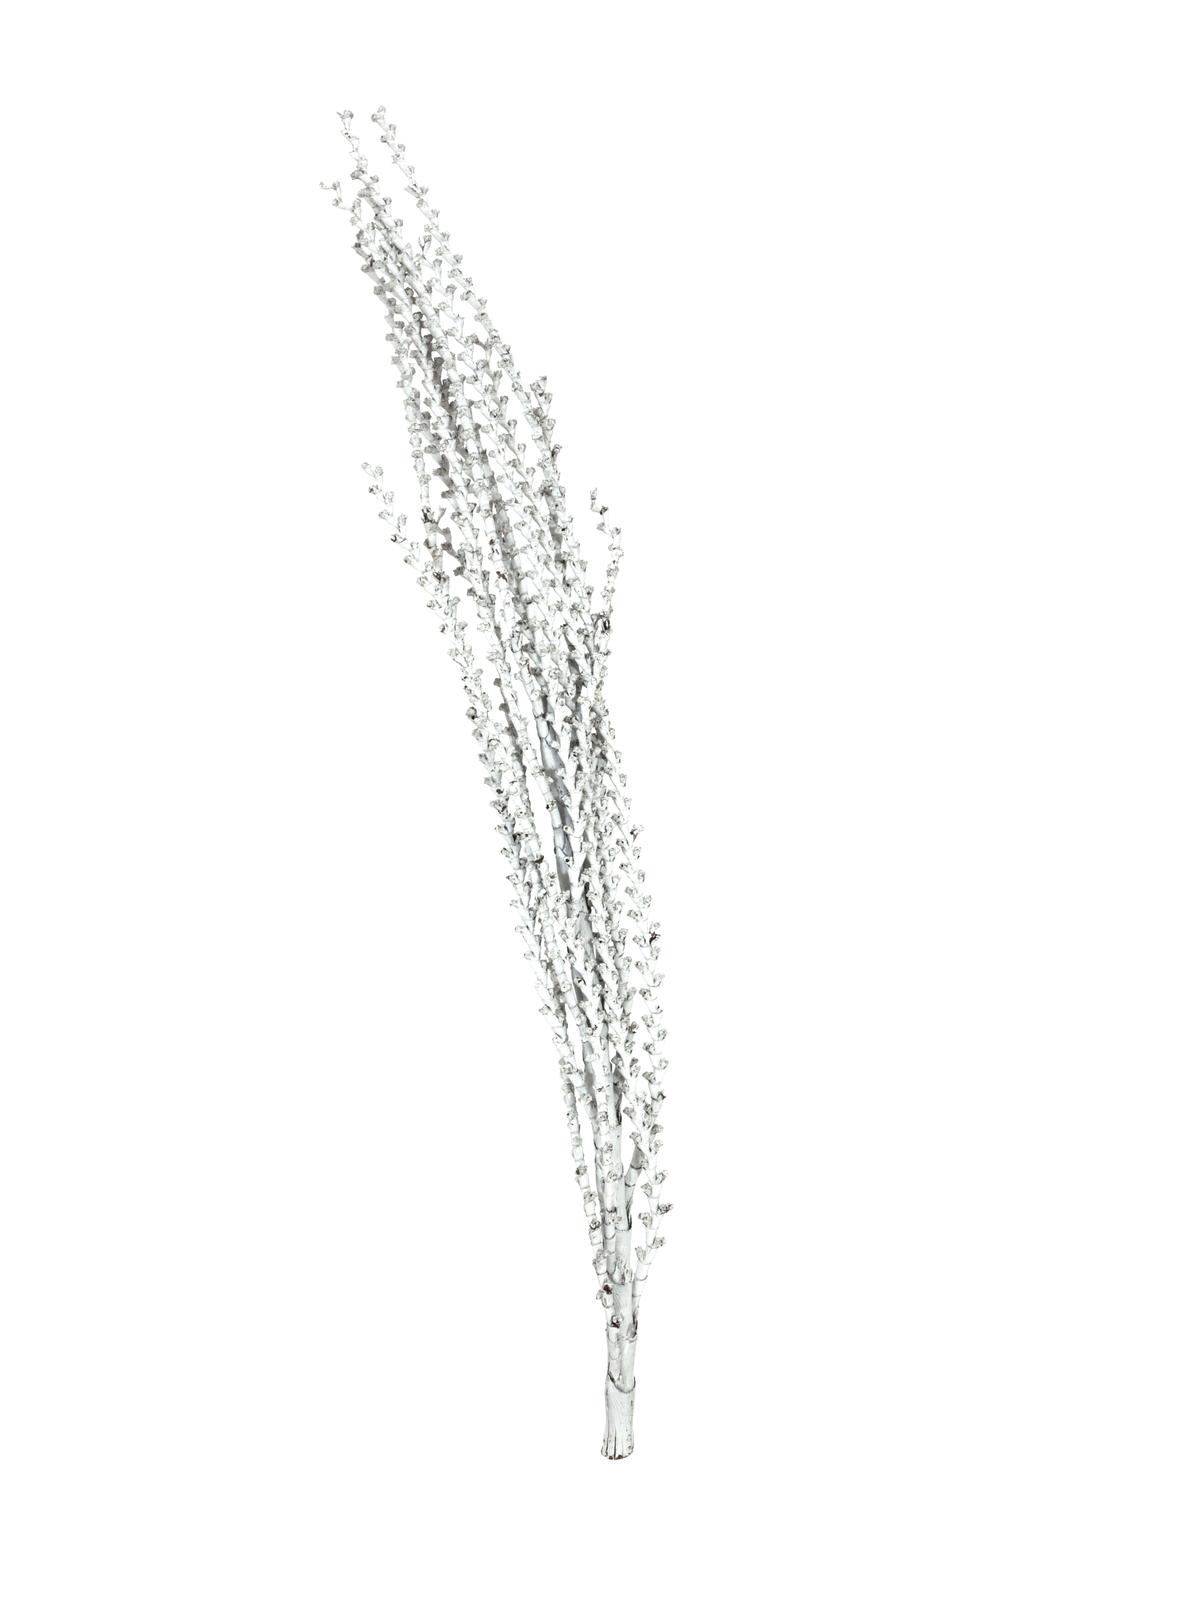 Galho Buriti přírodní větvička bílá, 150 cm